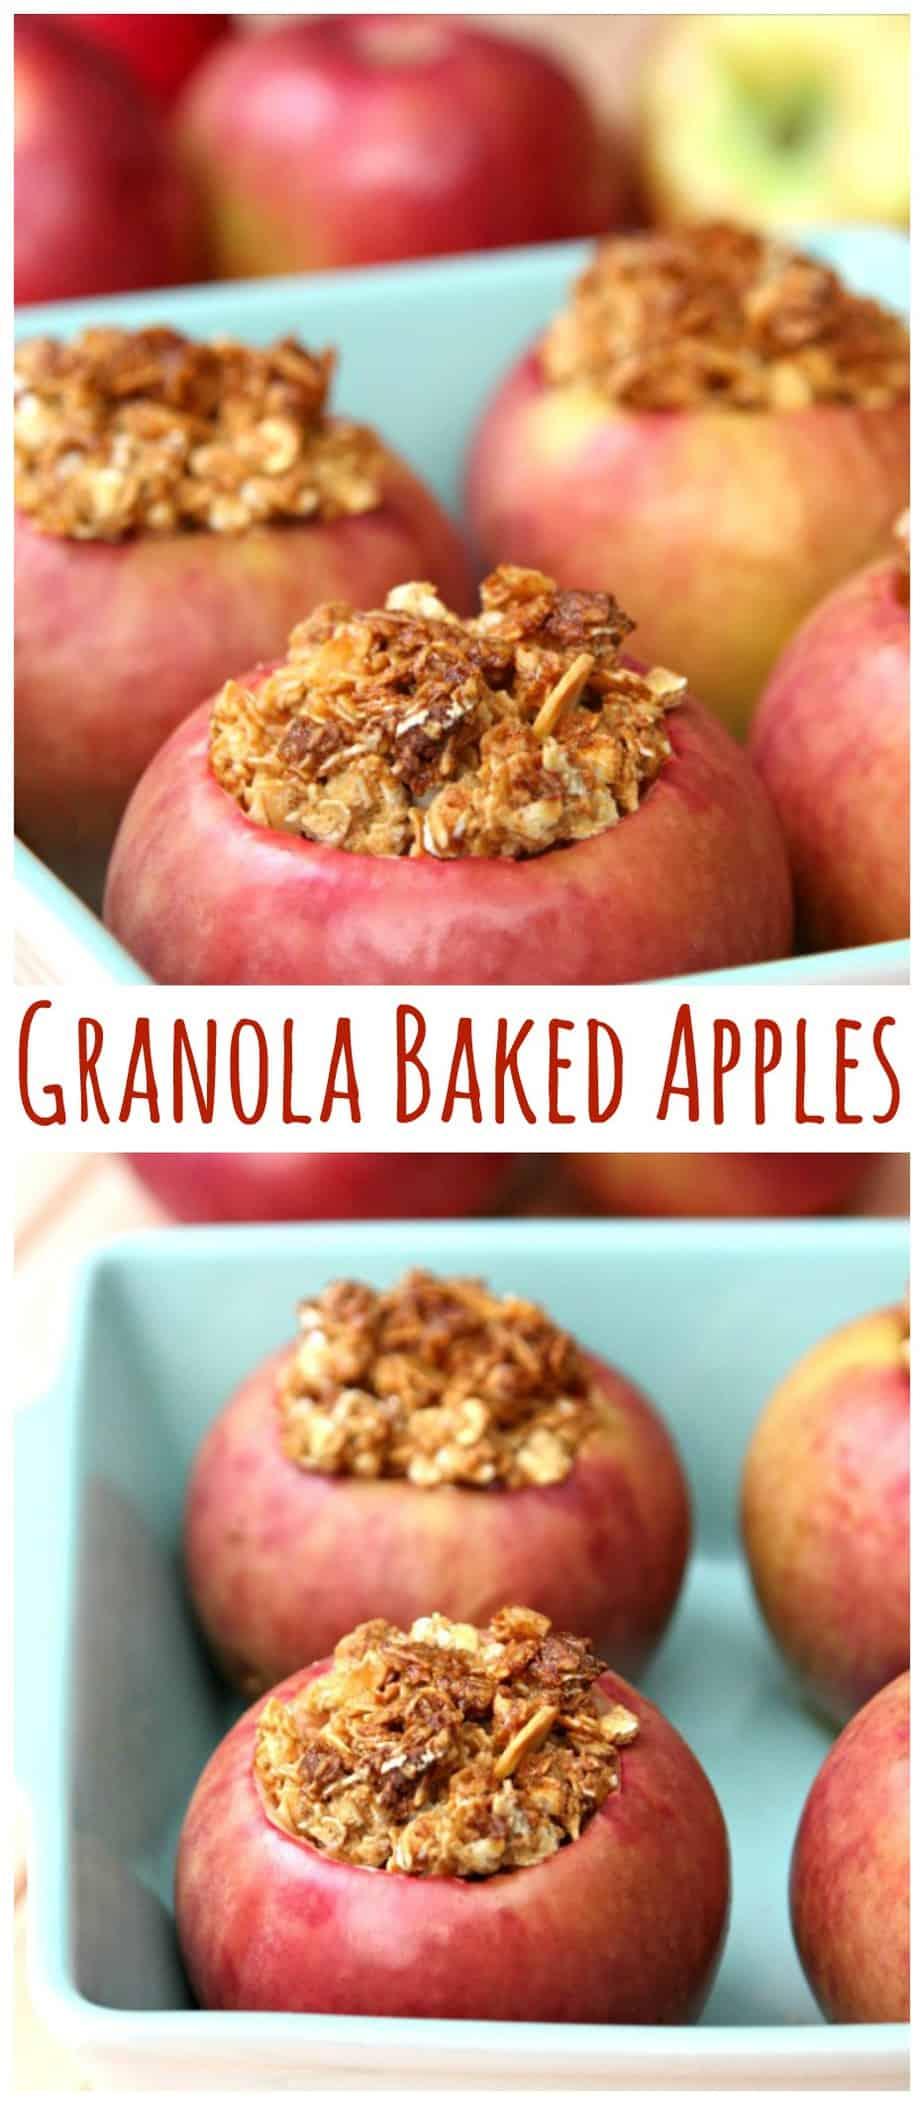 Granola Baked Apples